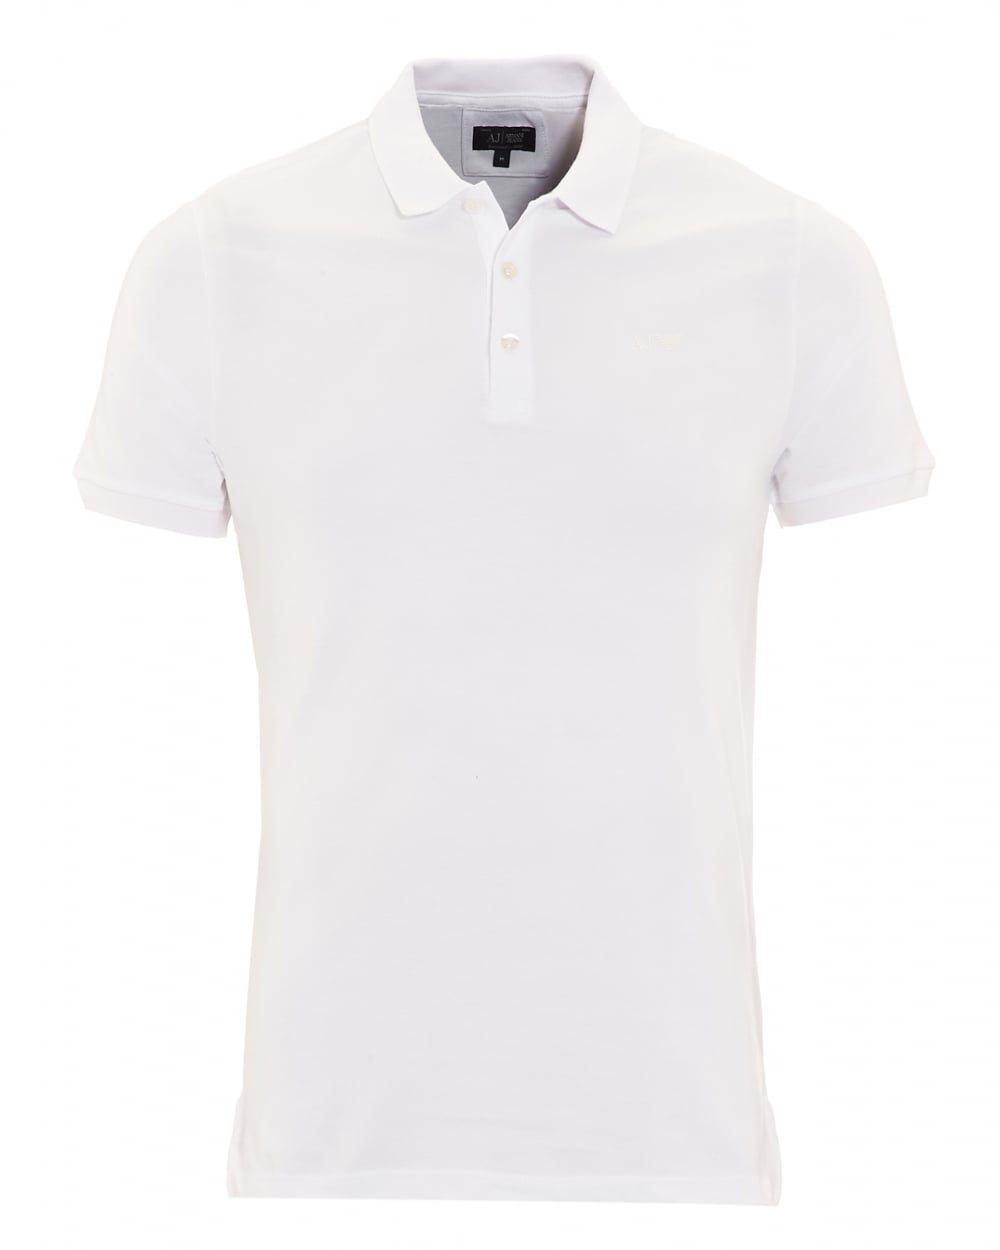 Armani Jeans Mens Polo Shirt, Plain White Short Sleeve Polo